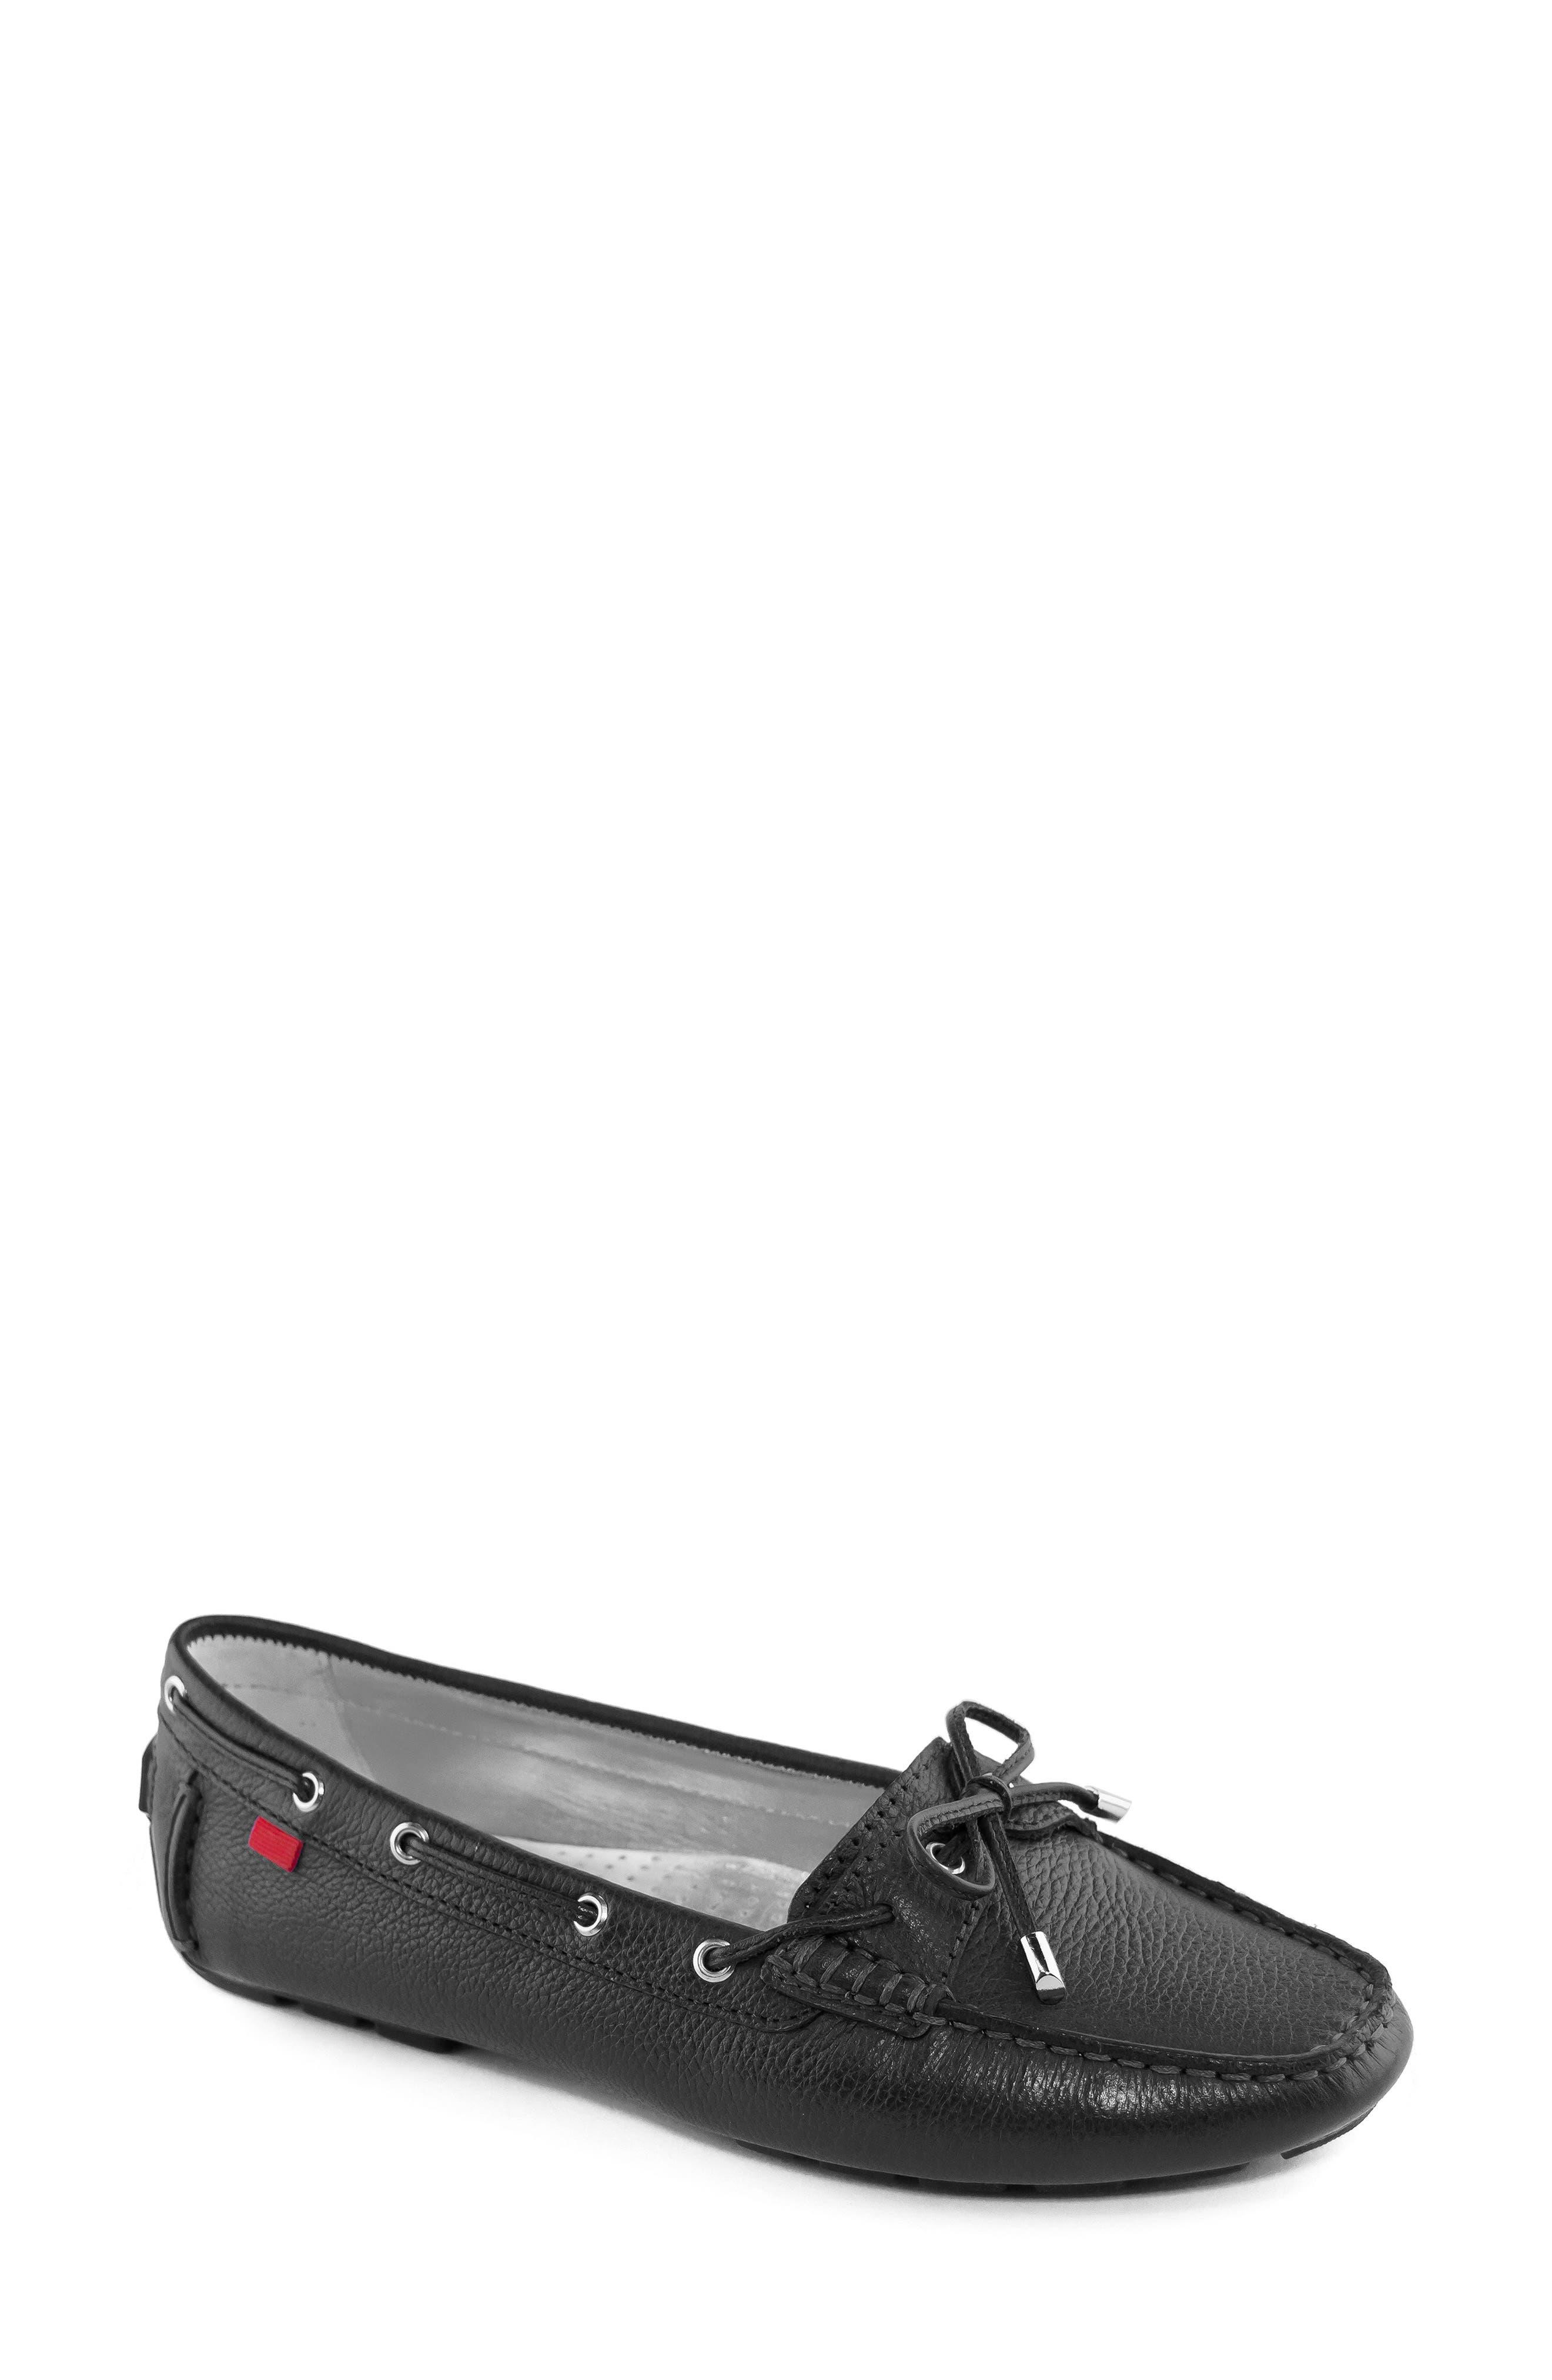 Marc Joseph New York Rockaway Loafer, Black